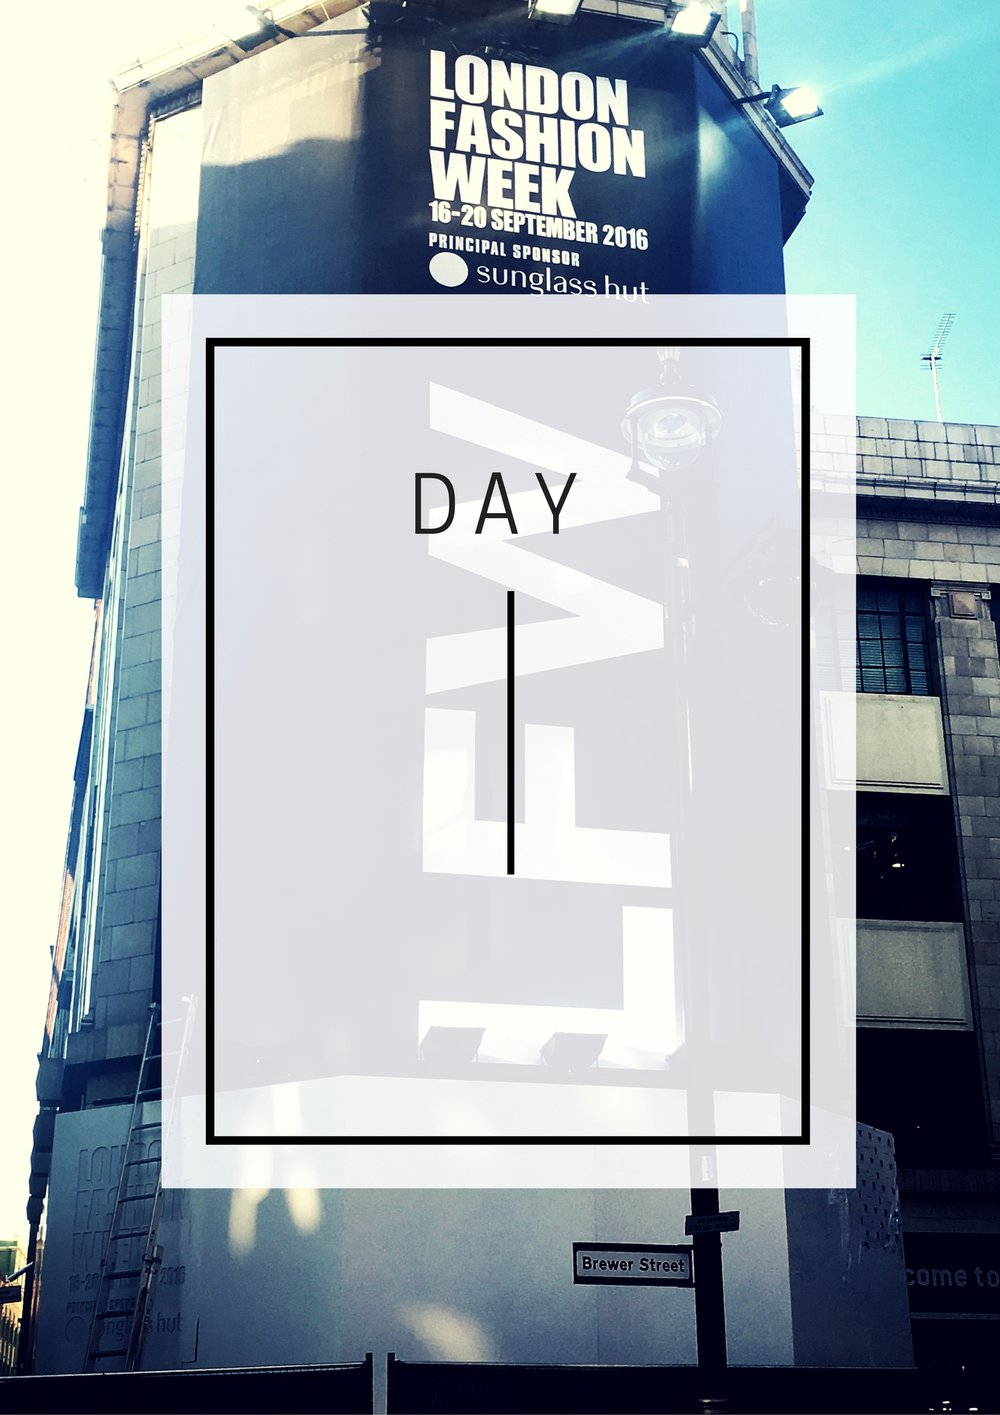 LFW-DAY-1.jpg